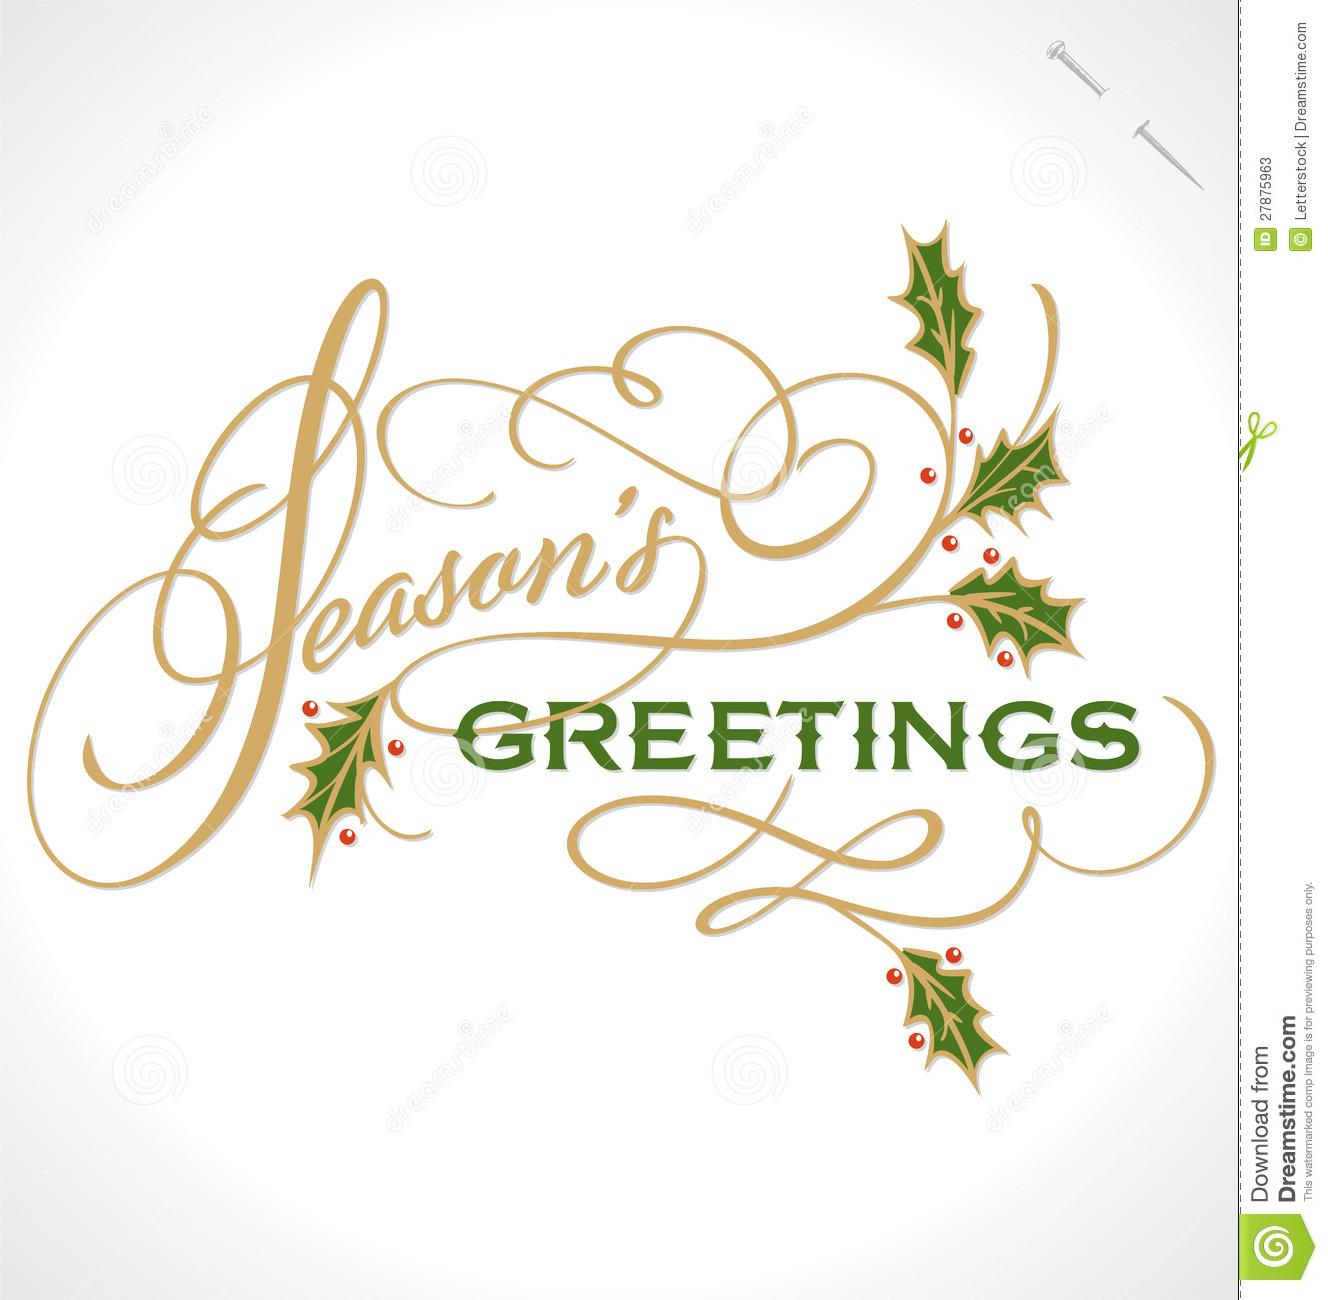 Seasons Greetings Banner Clipart.